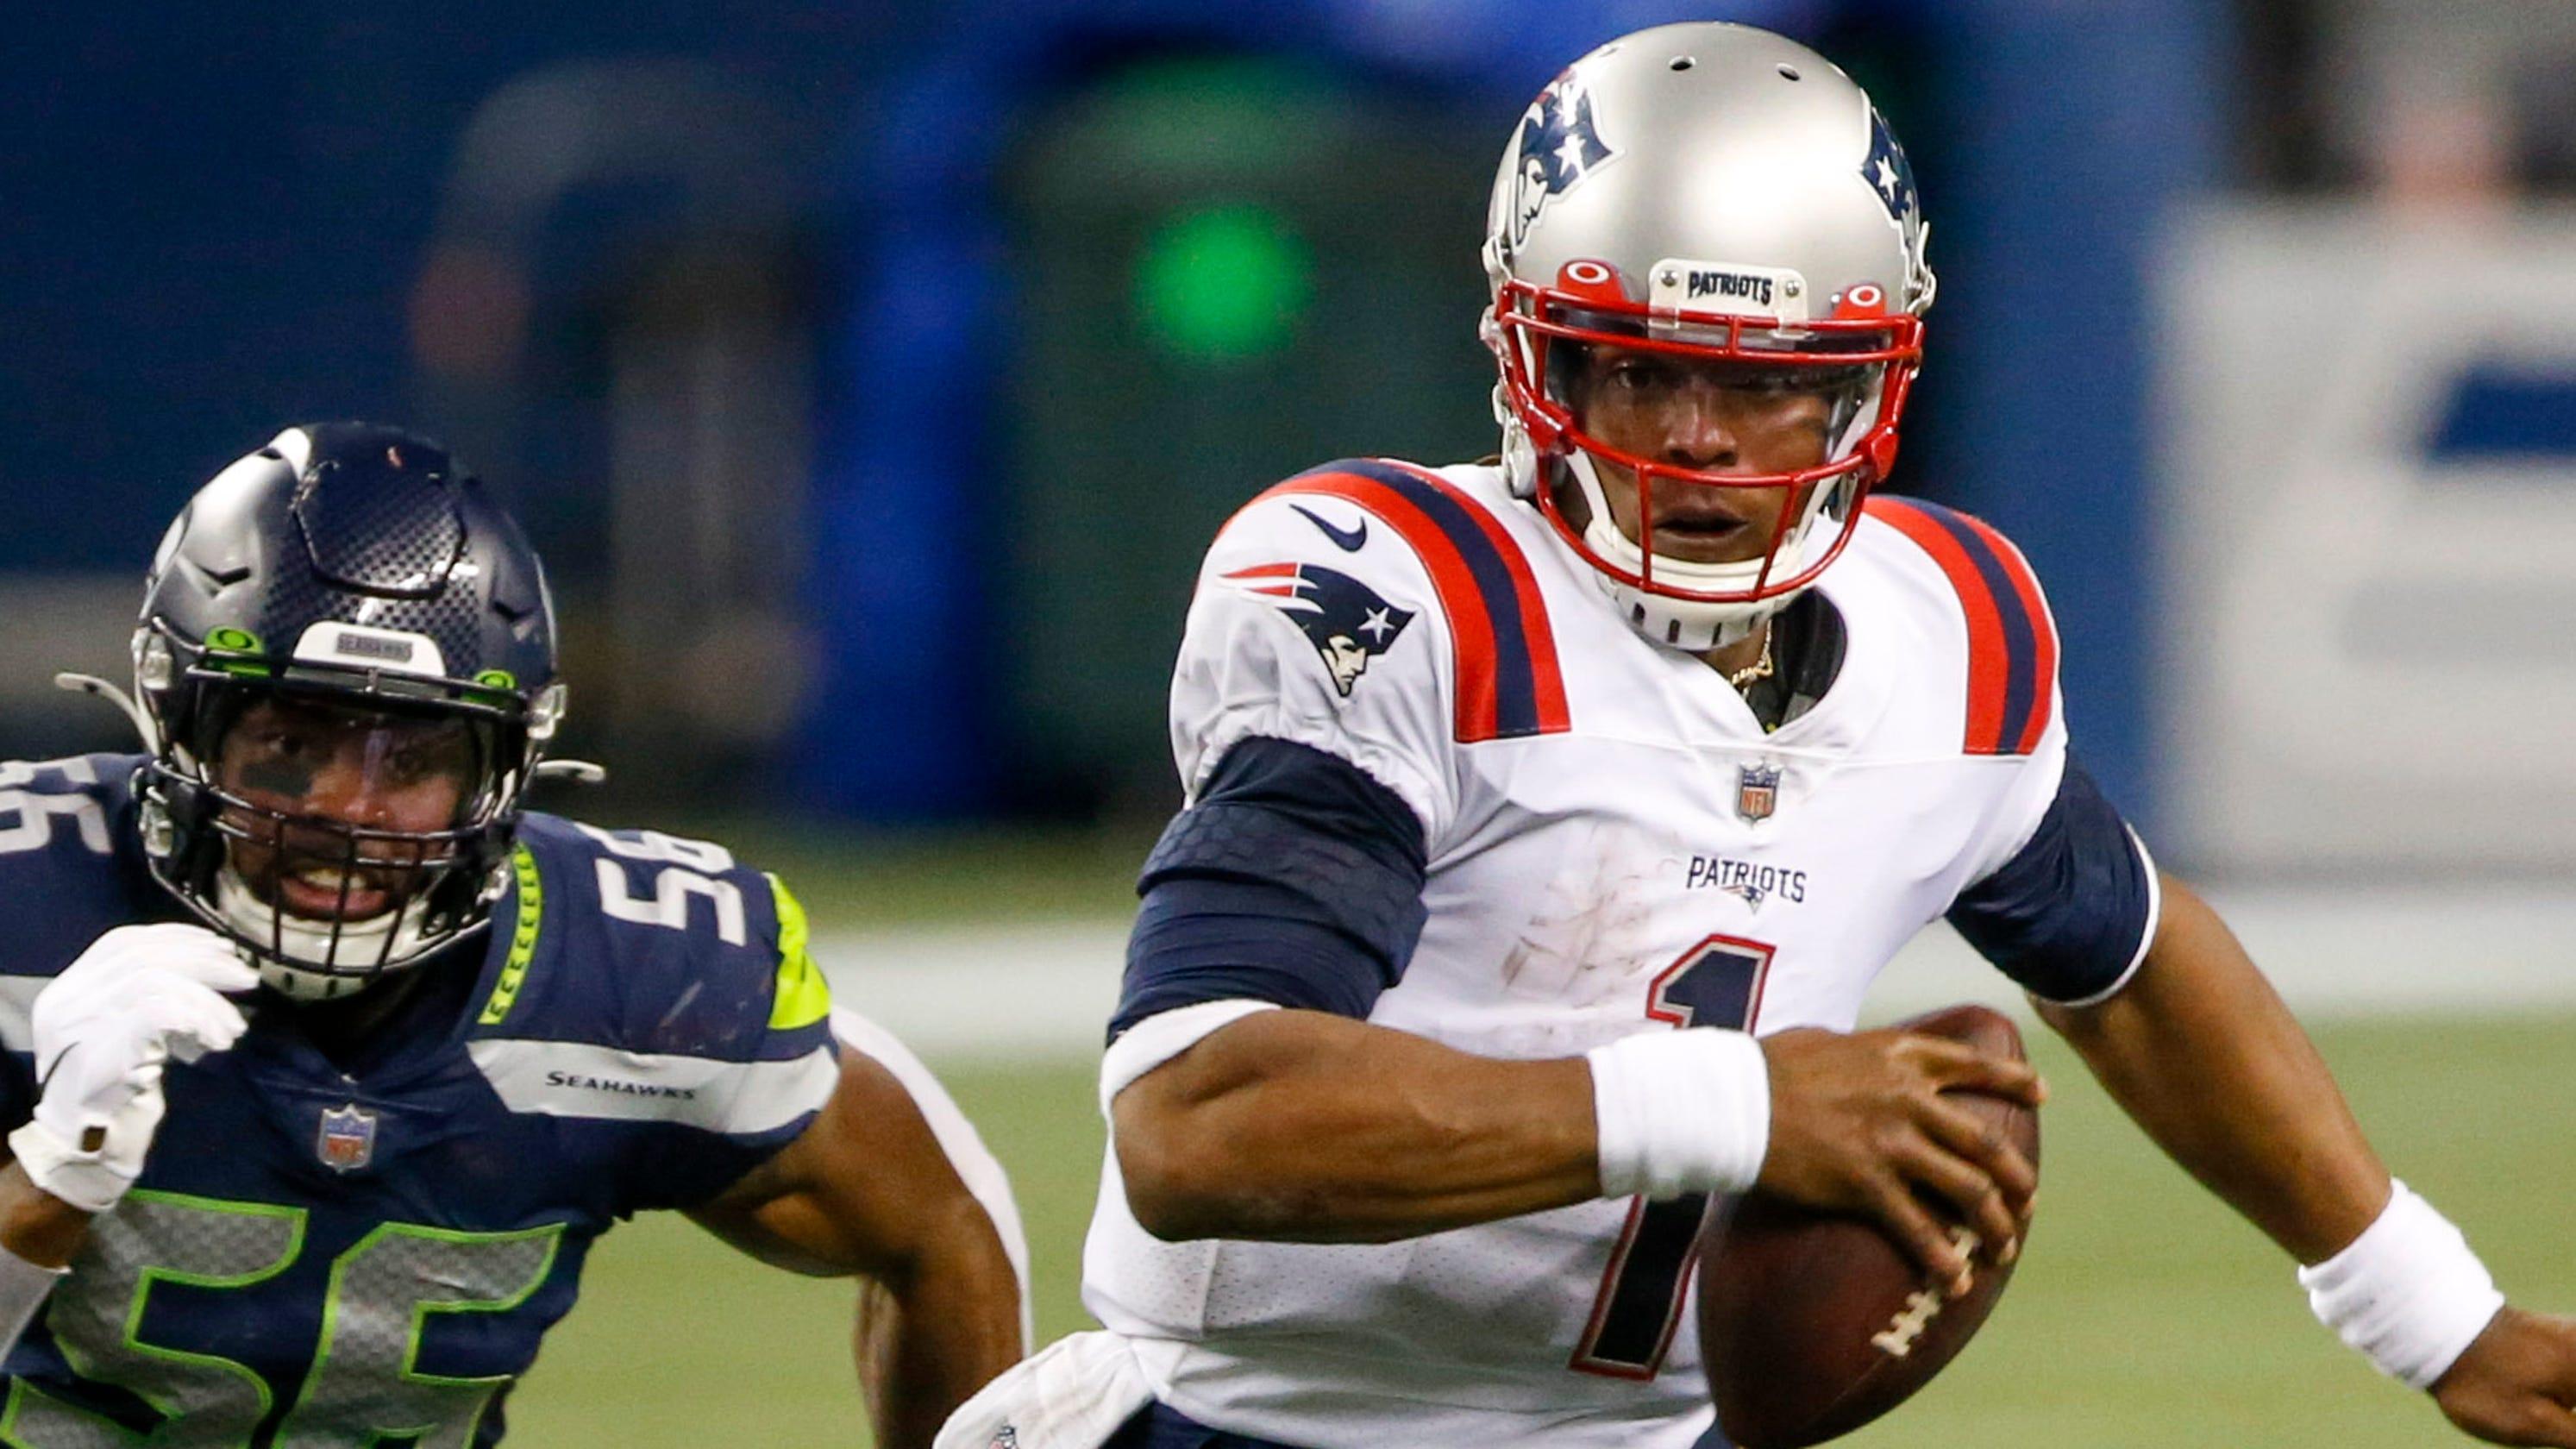 Jon Gruden has high praise for 'Slam' Newton ahead of Patriots-Raiders contest